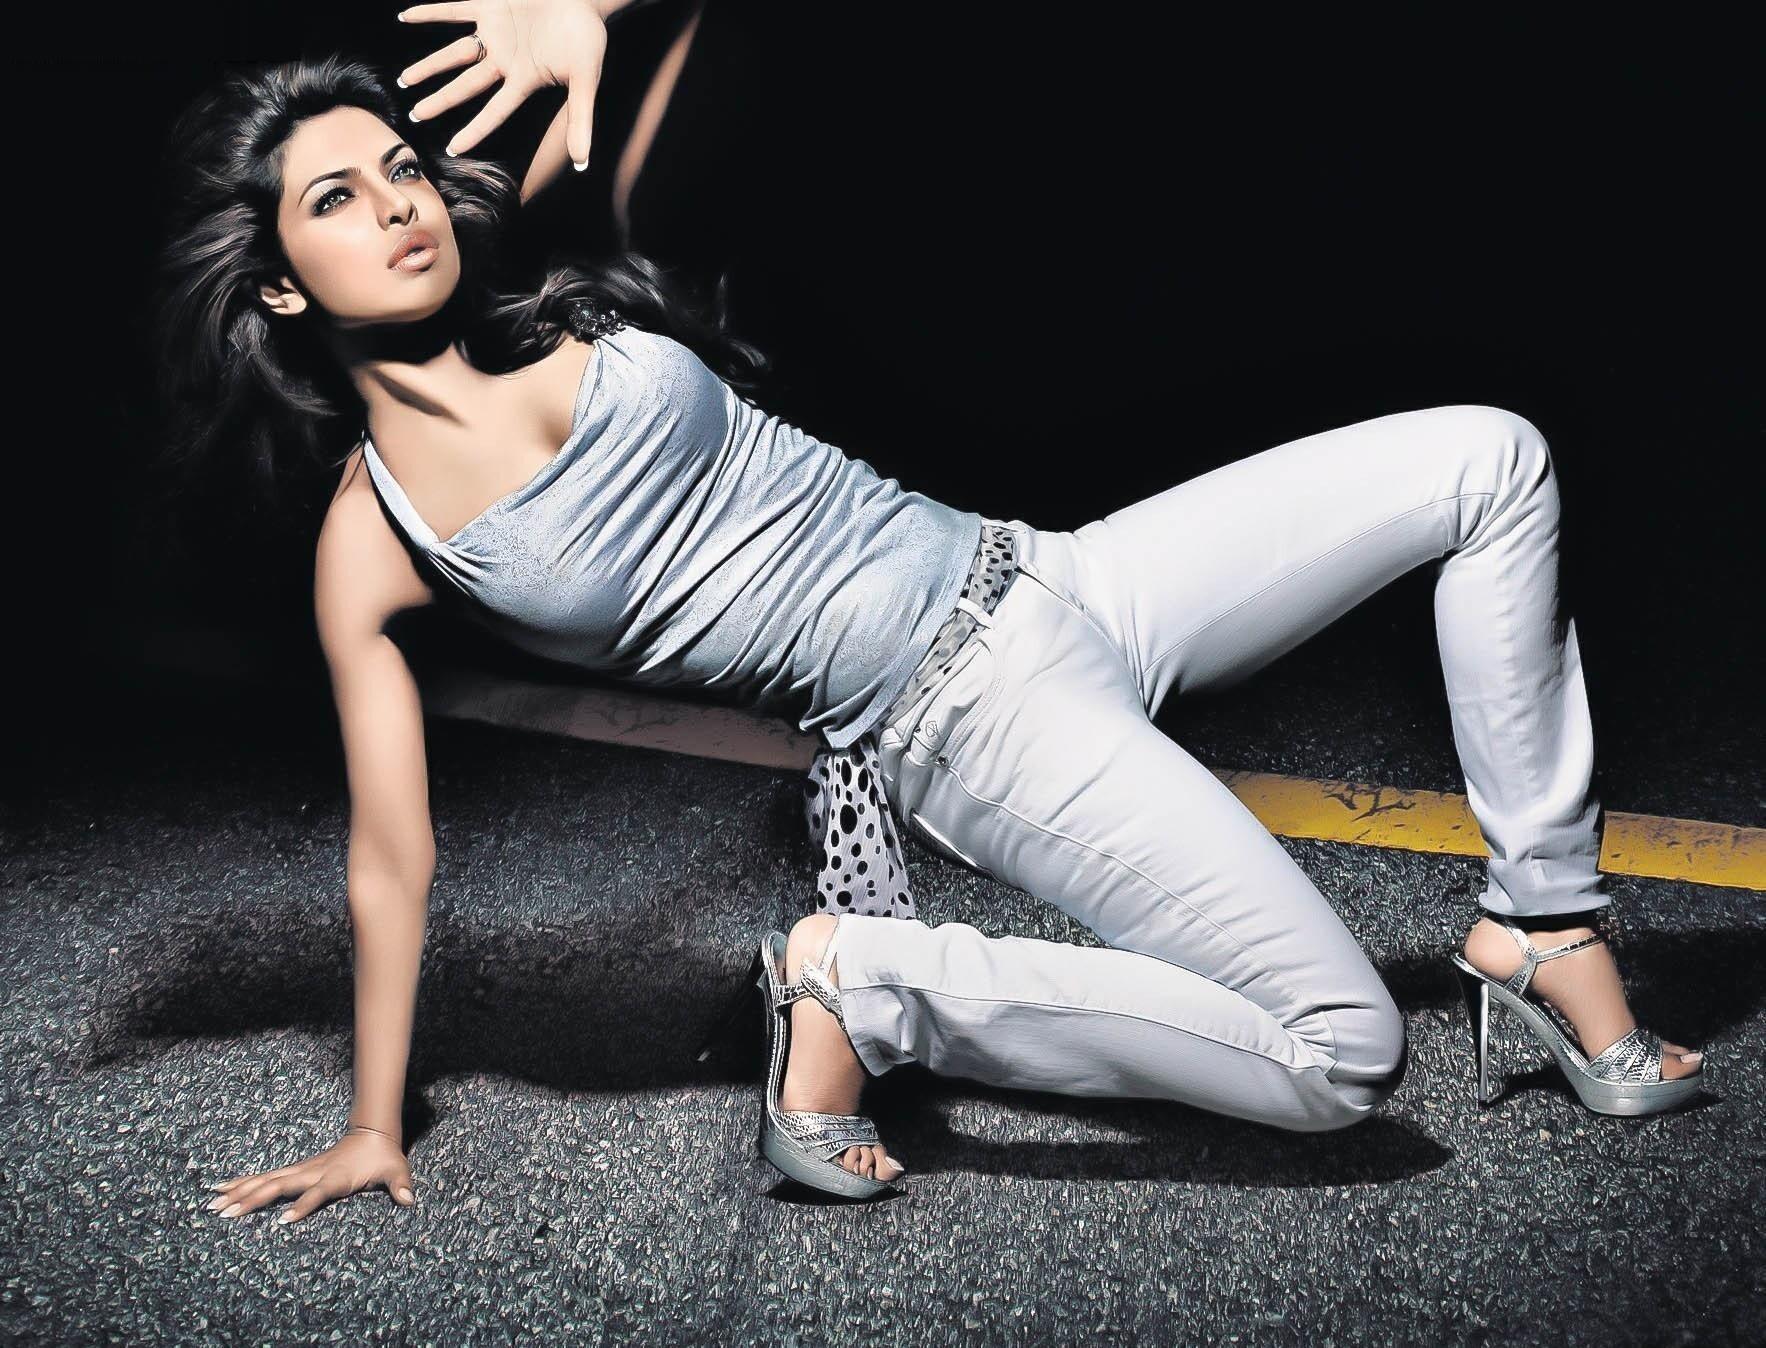 Priyanka Chopra Hd Wallpapers 1920x1080 50355 Movieweb